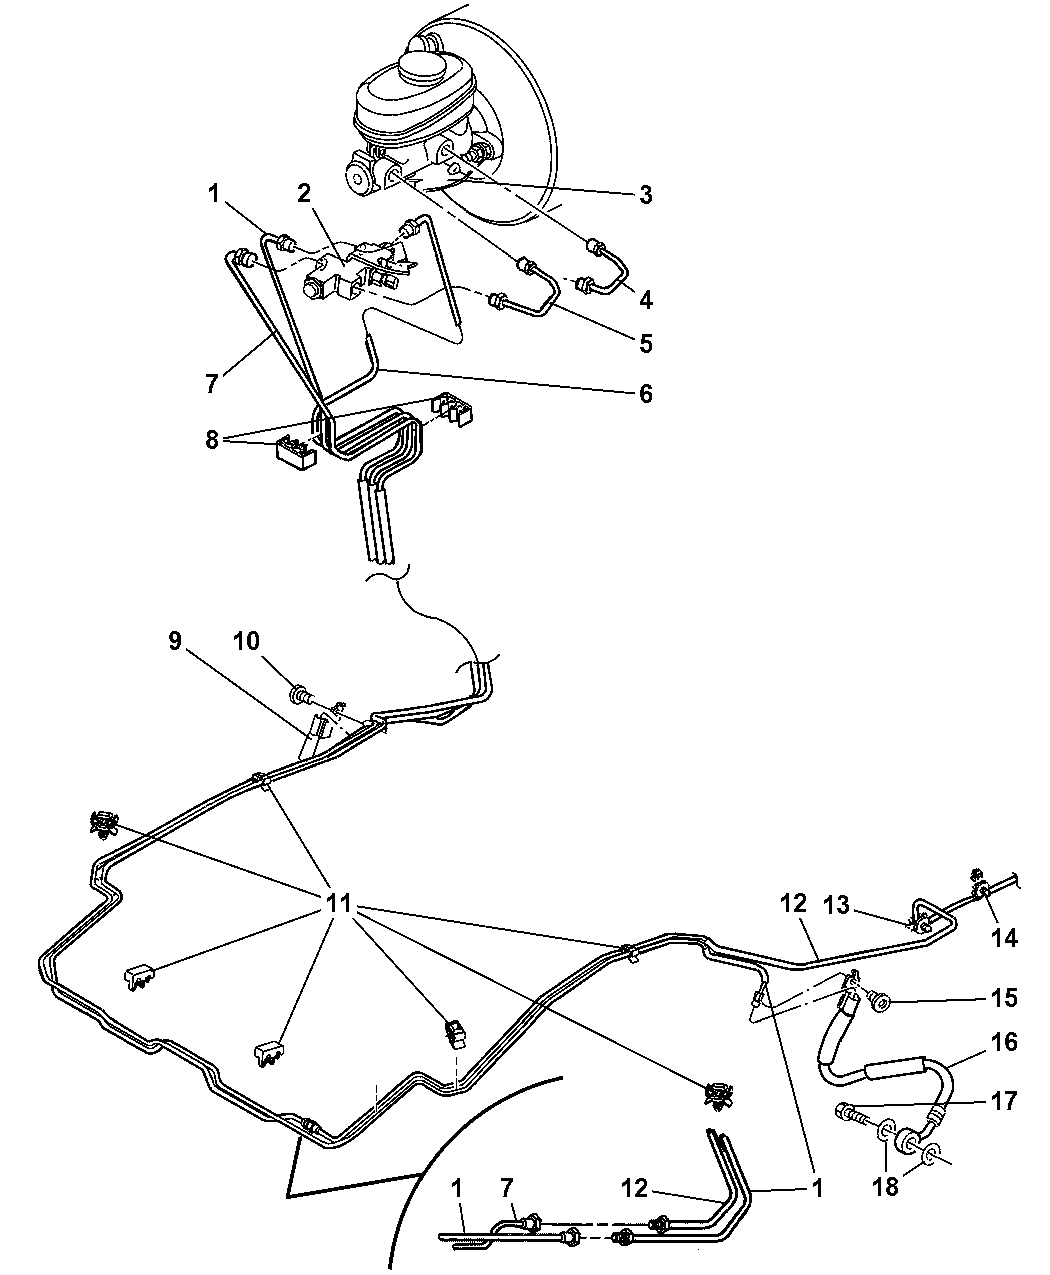 Ton Chevrolet Truck Wiring Diagram on